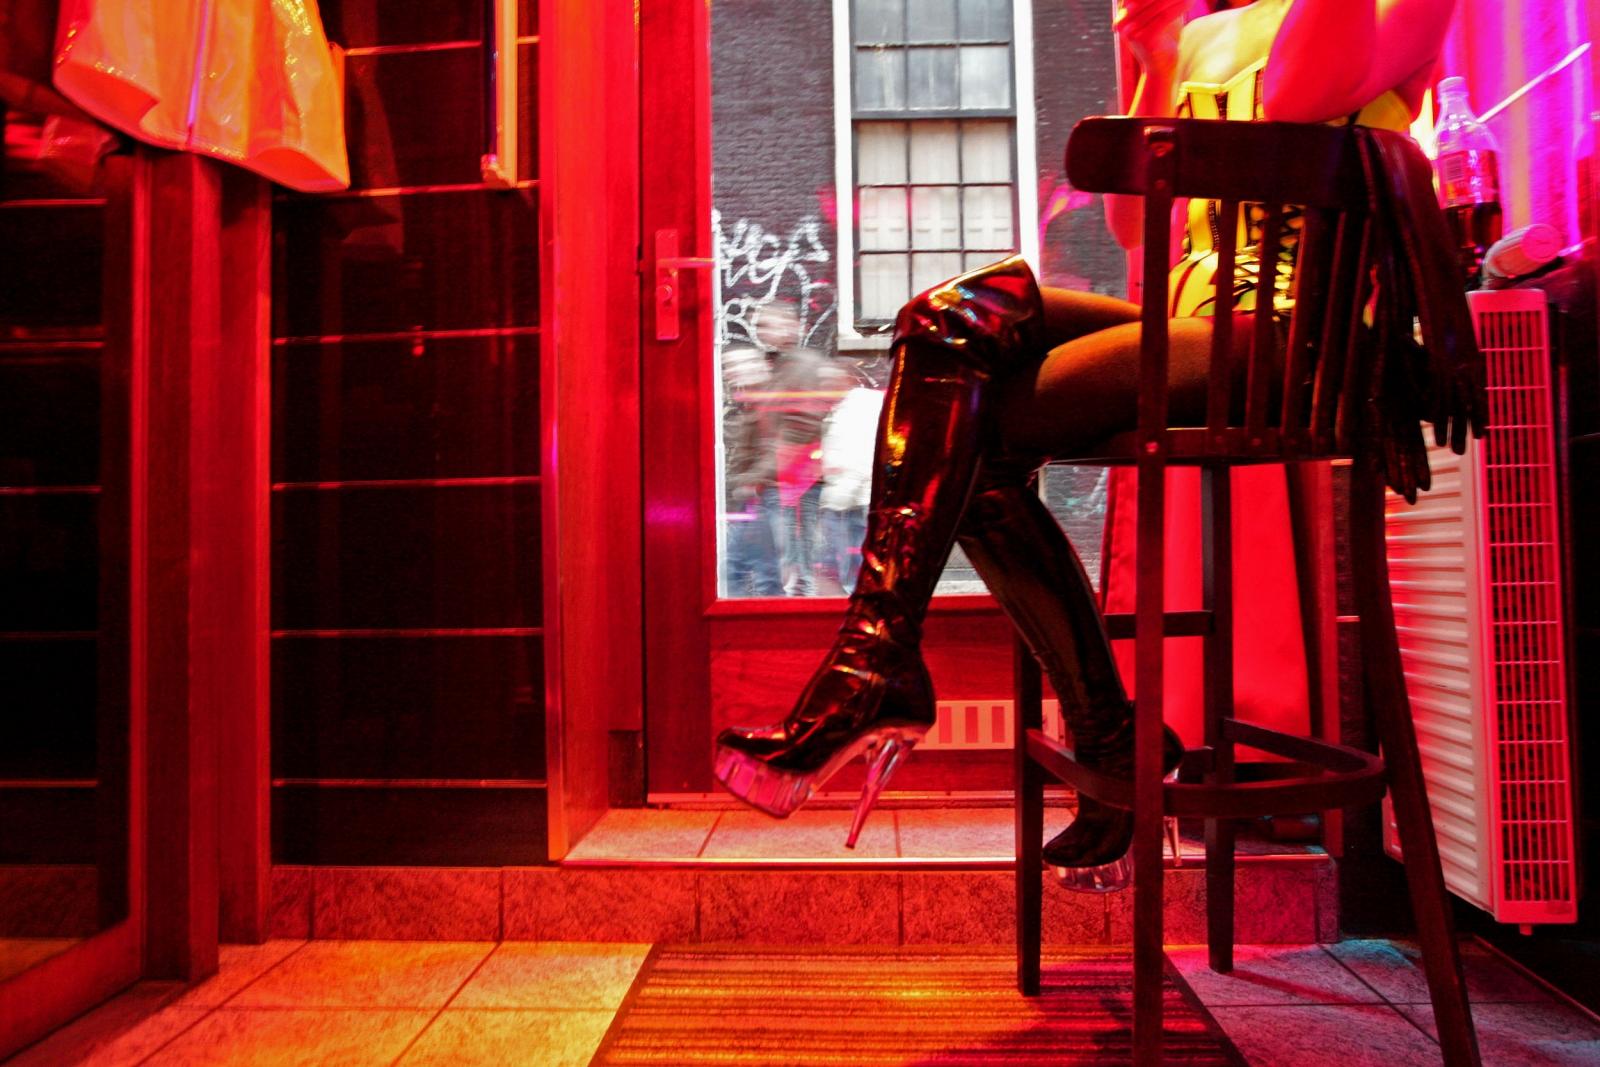 Netherlands Prostitution